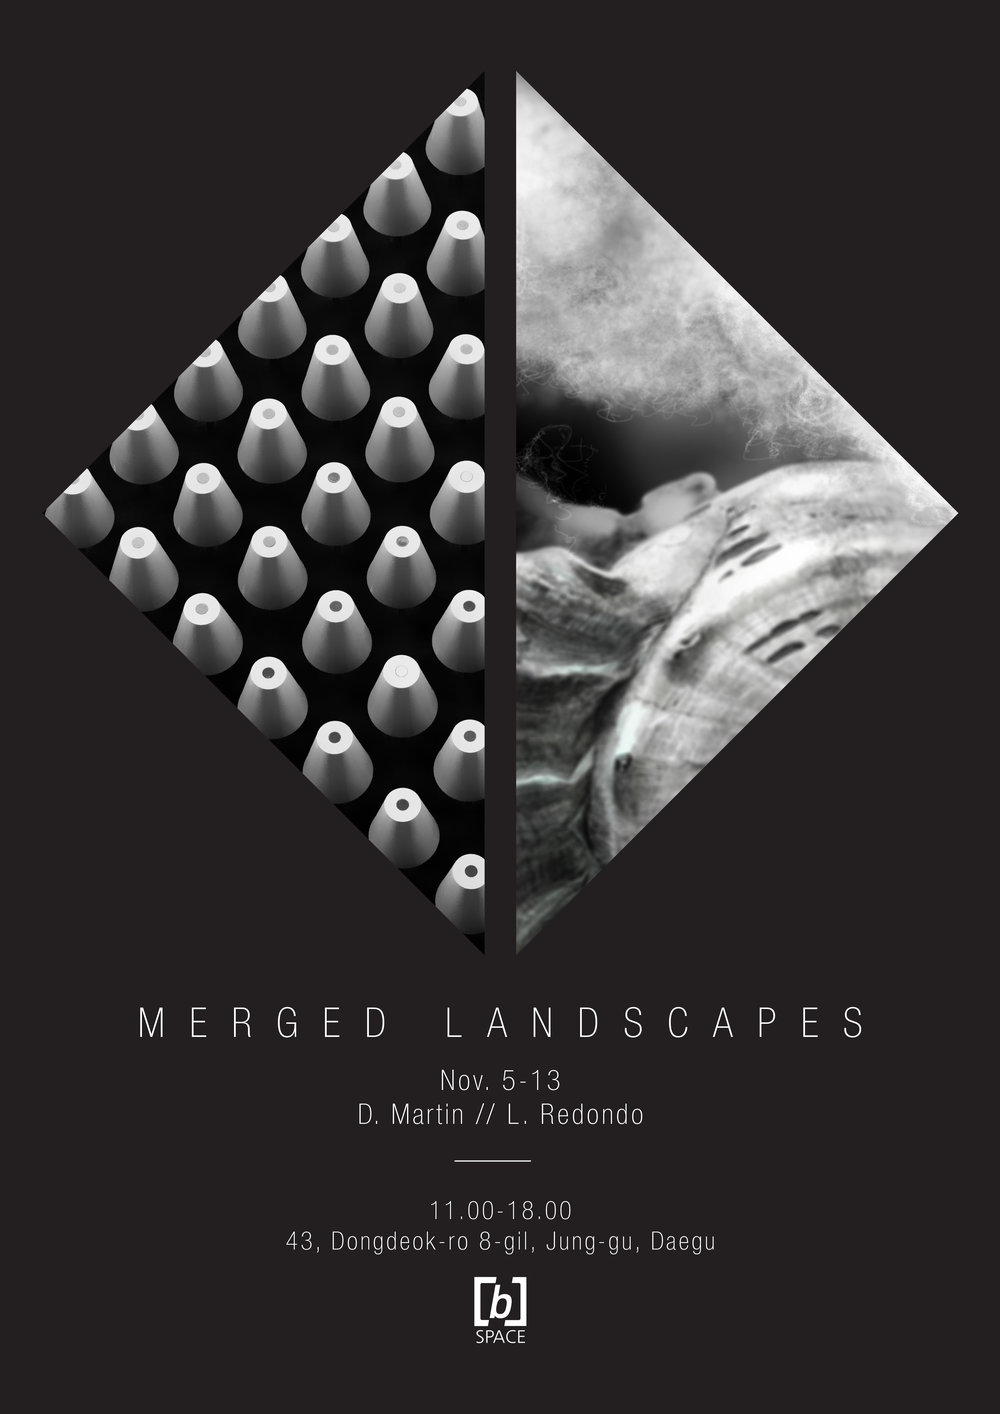 MERGED LANDSCAPES - DAVID Martin // LUCAS RedondoDuo exhibition, November 5 to 13, 2018, at [b]SPACE, Daegu.(opening reception party, Nov.5, 6 pm.)